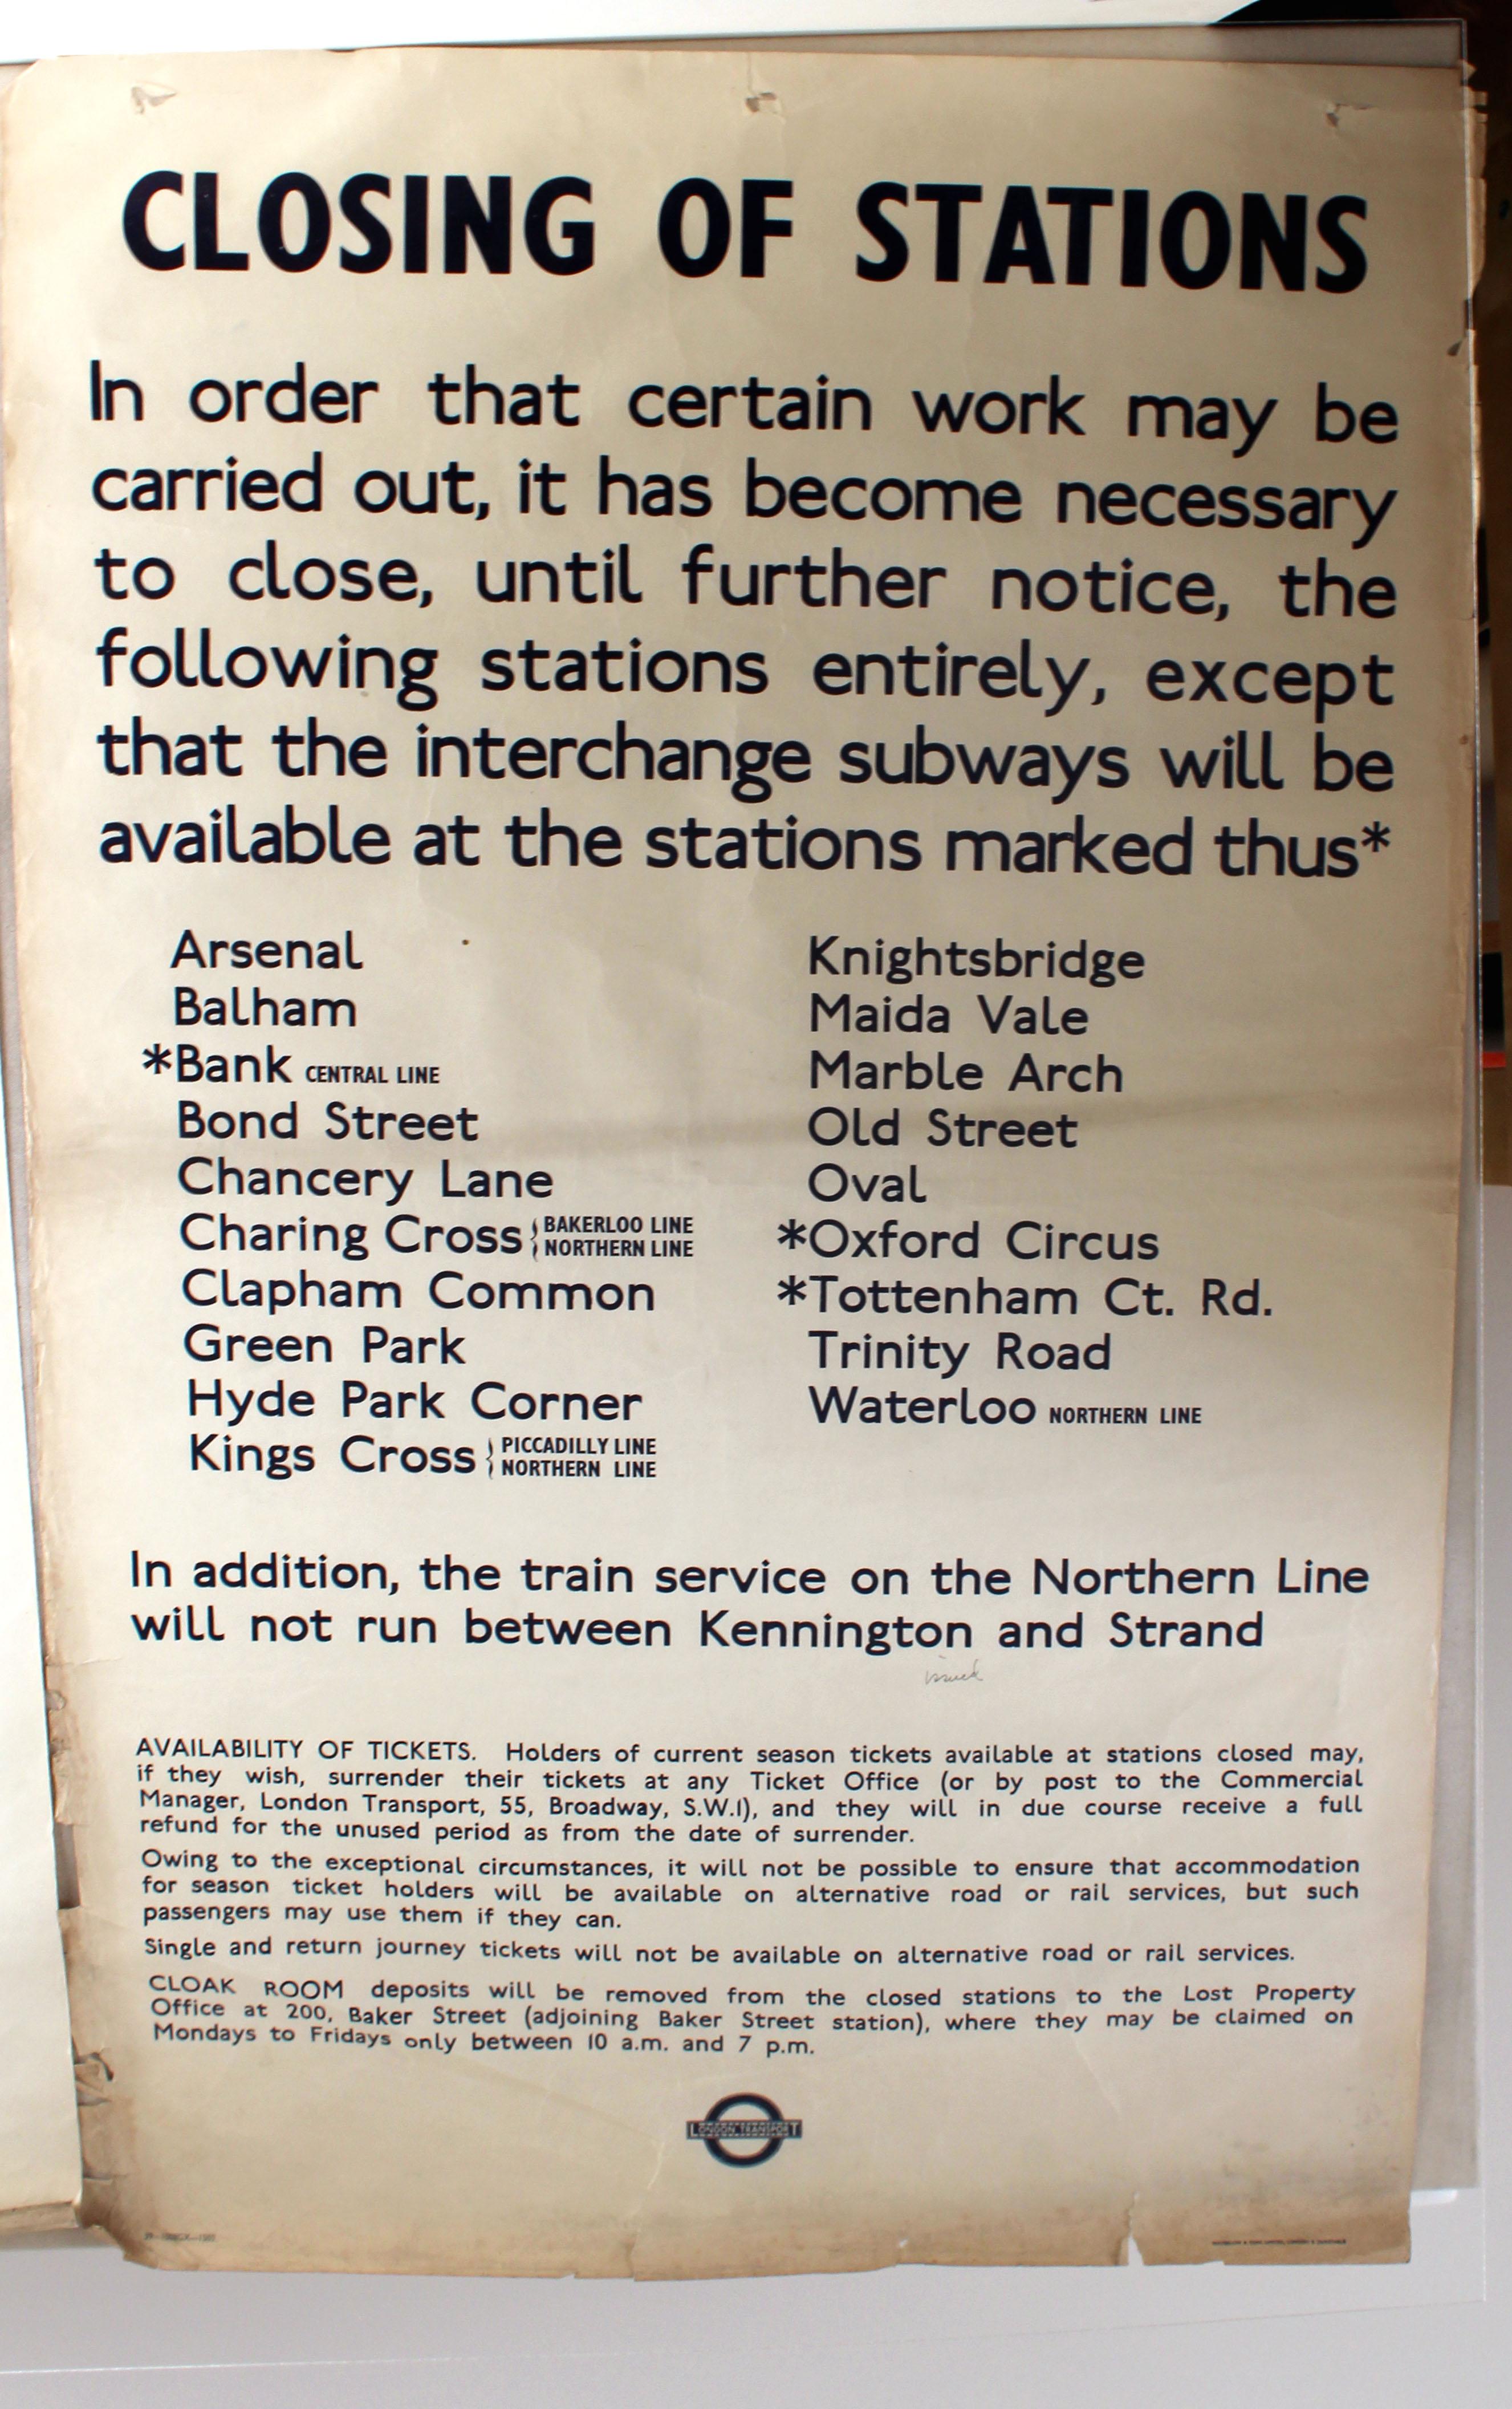 Lot 1407 - Original London Underground Poster Station Closure 1939